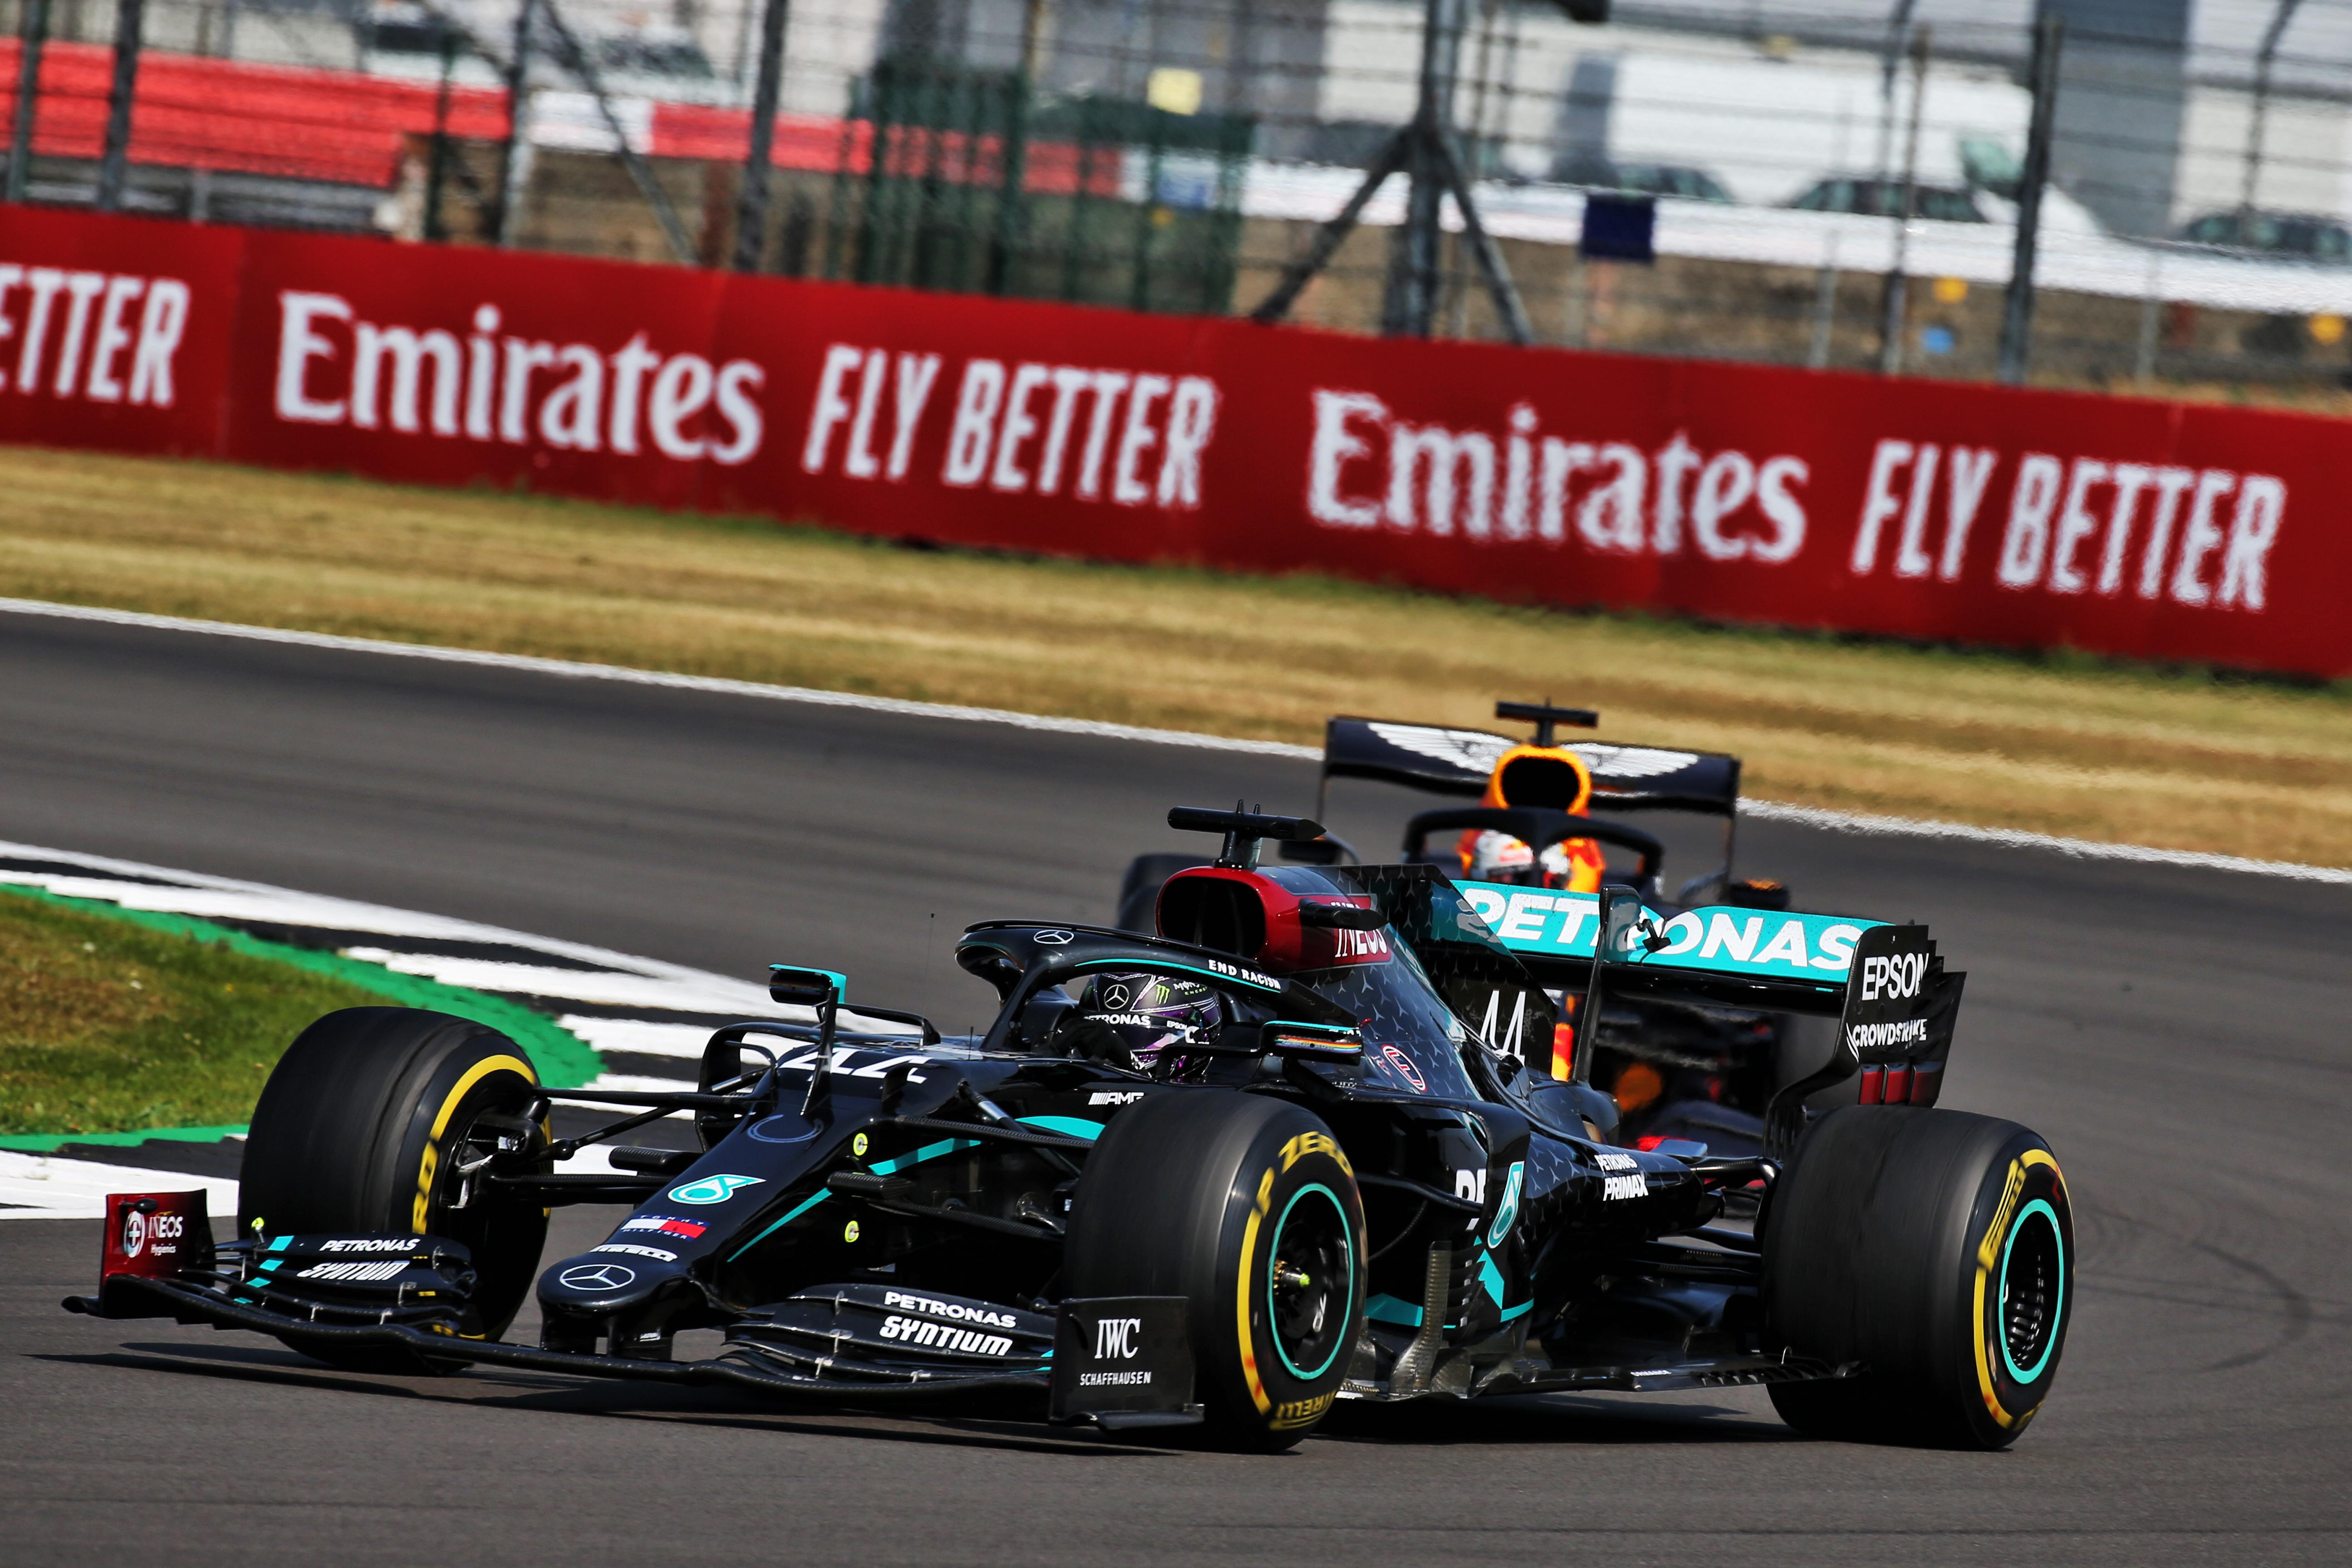 Lewis Hamilton Mercedes Max Verstappen Red Bull Silverstone 2020